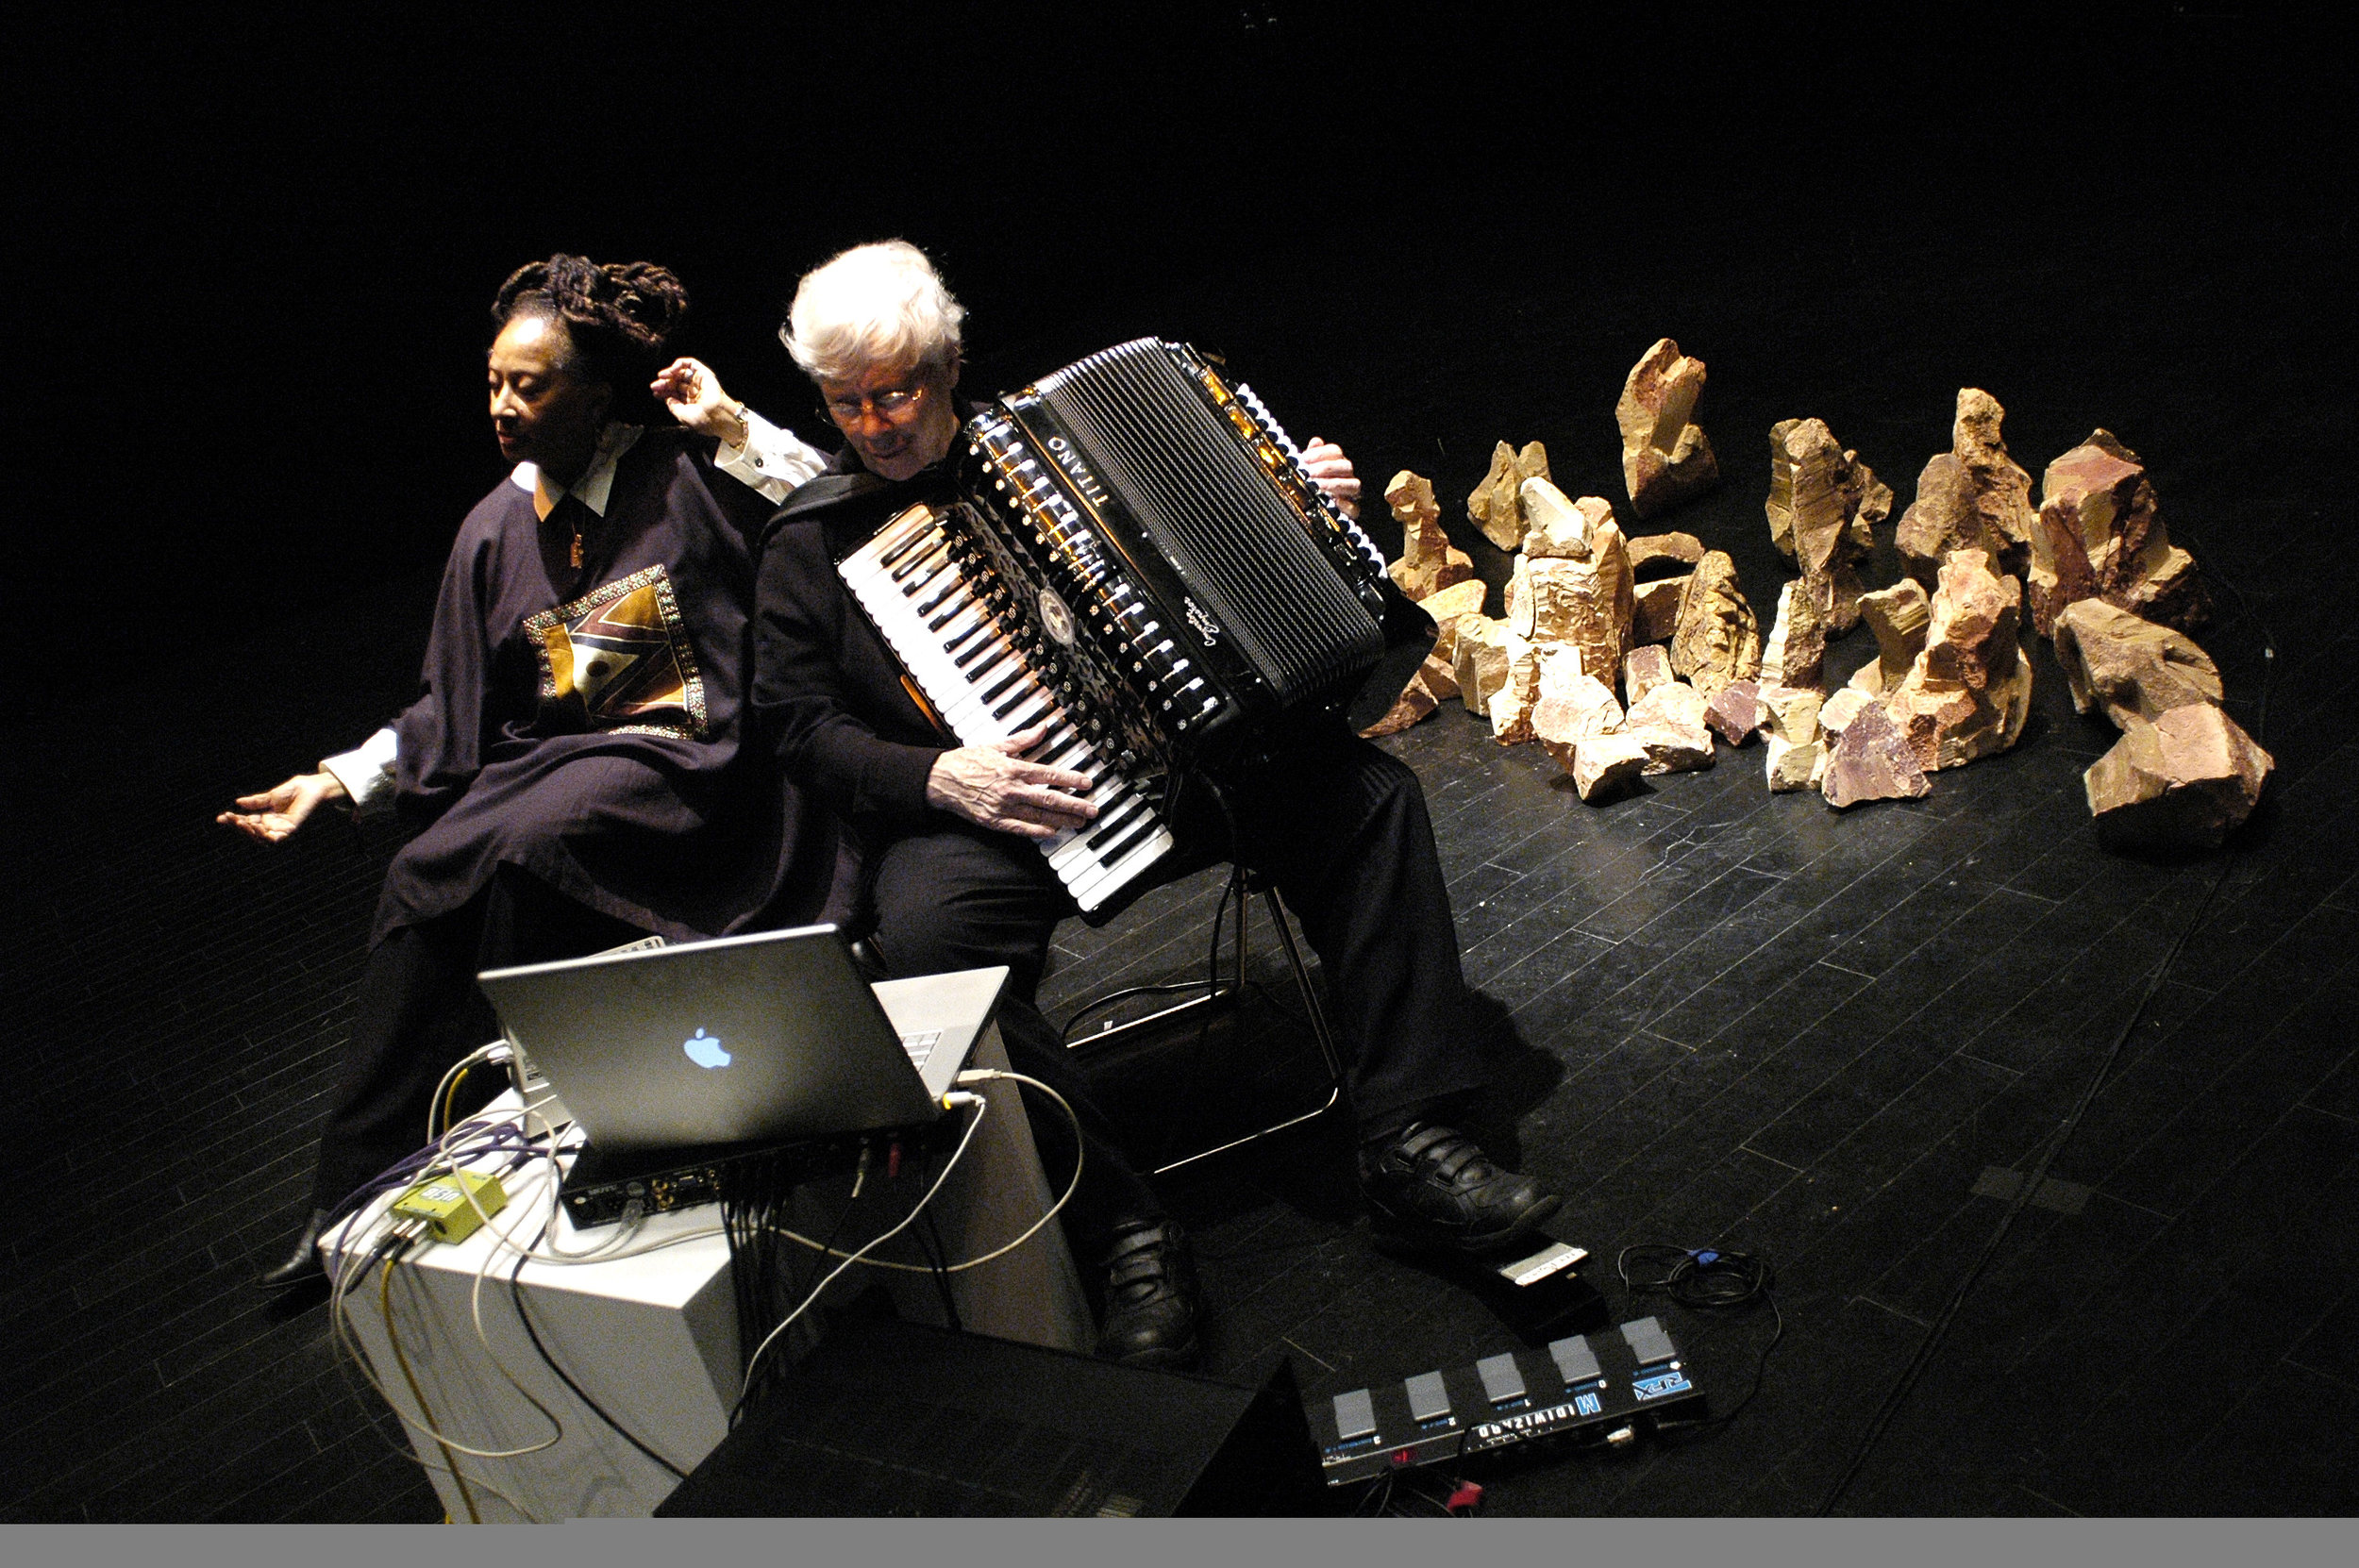 Pauline Oliveros and IONE in performance, photo: Heriko Ikeda